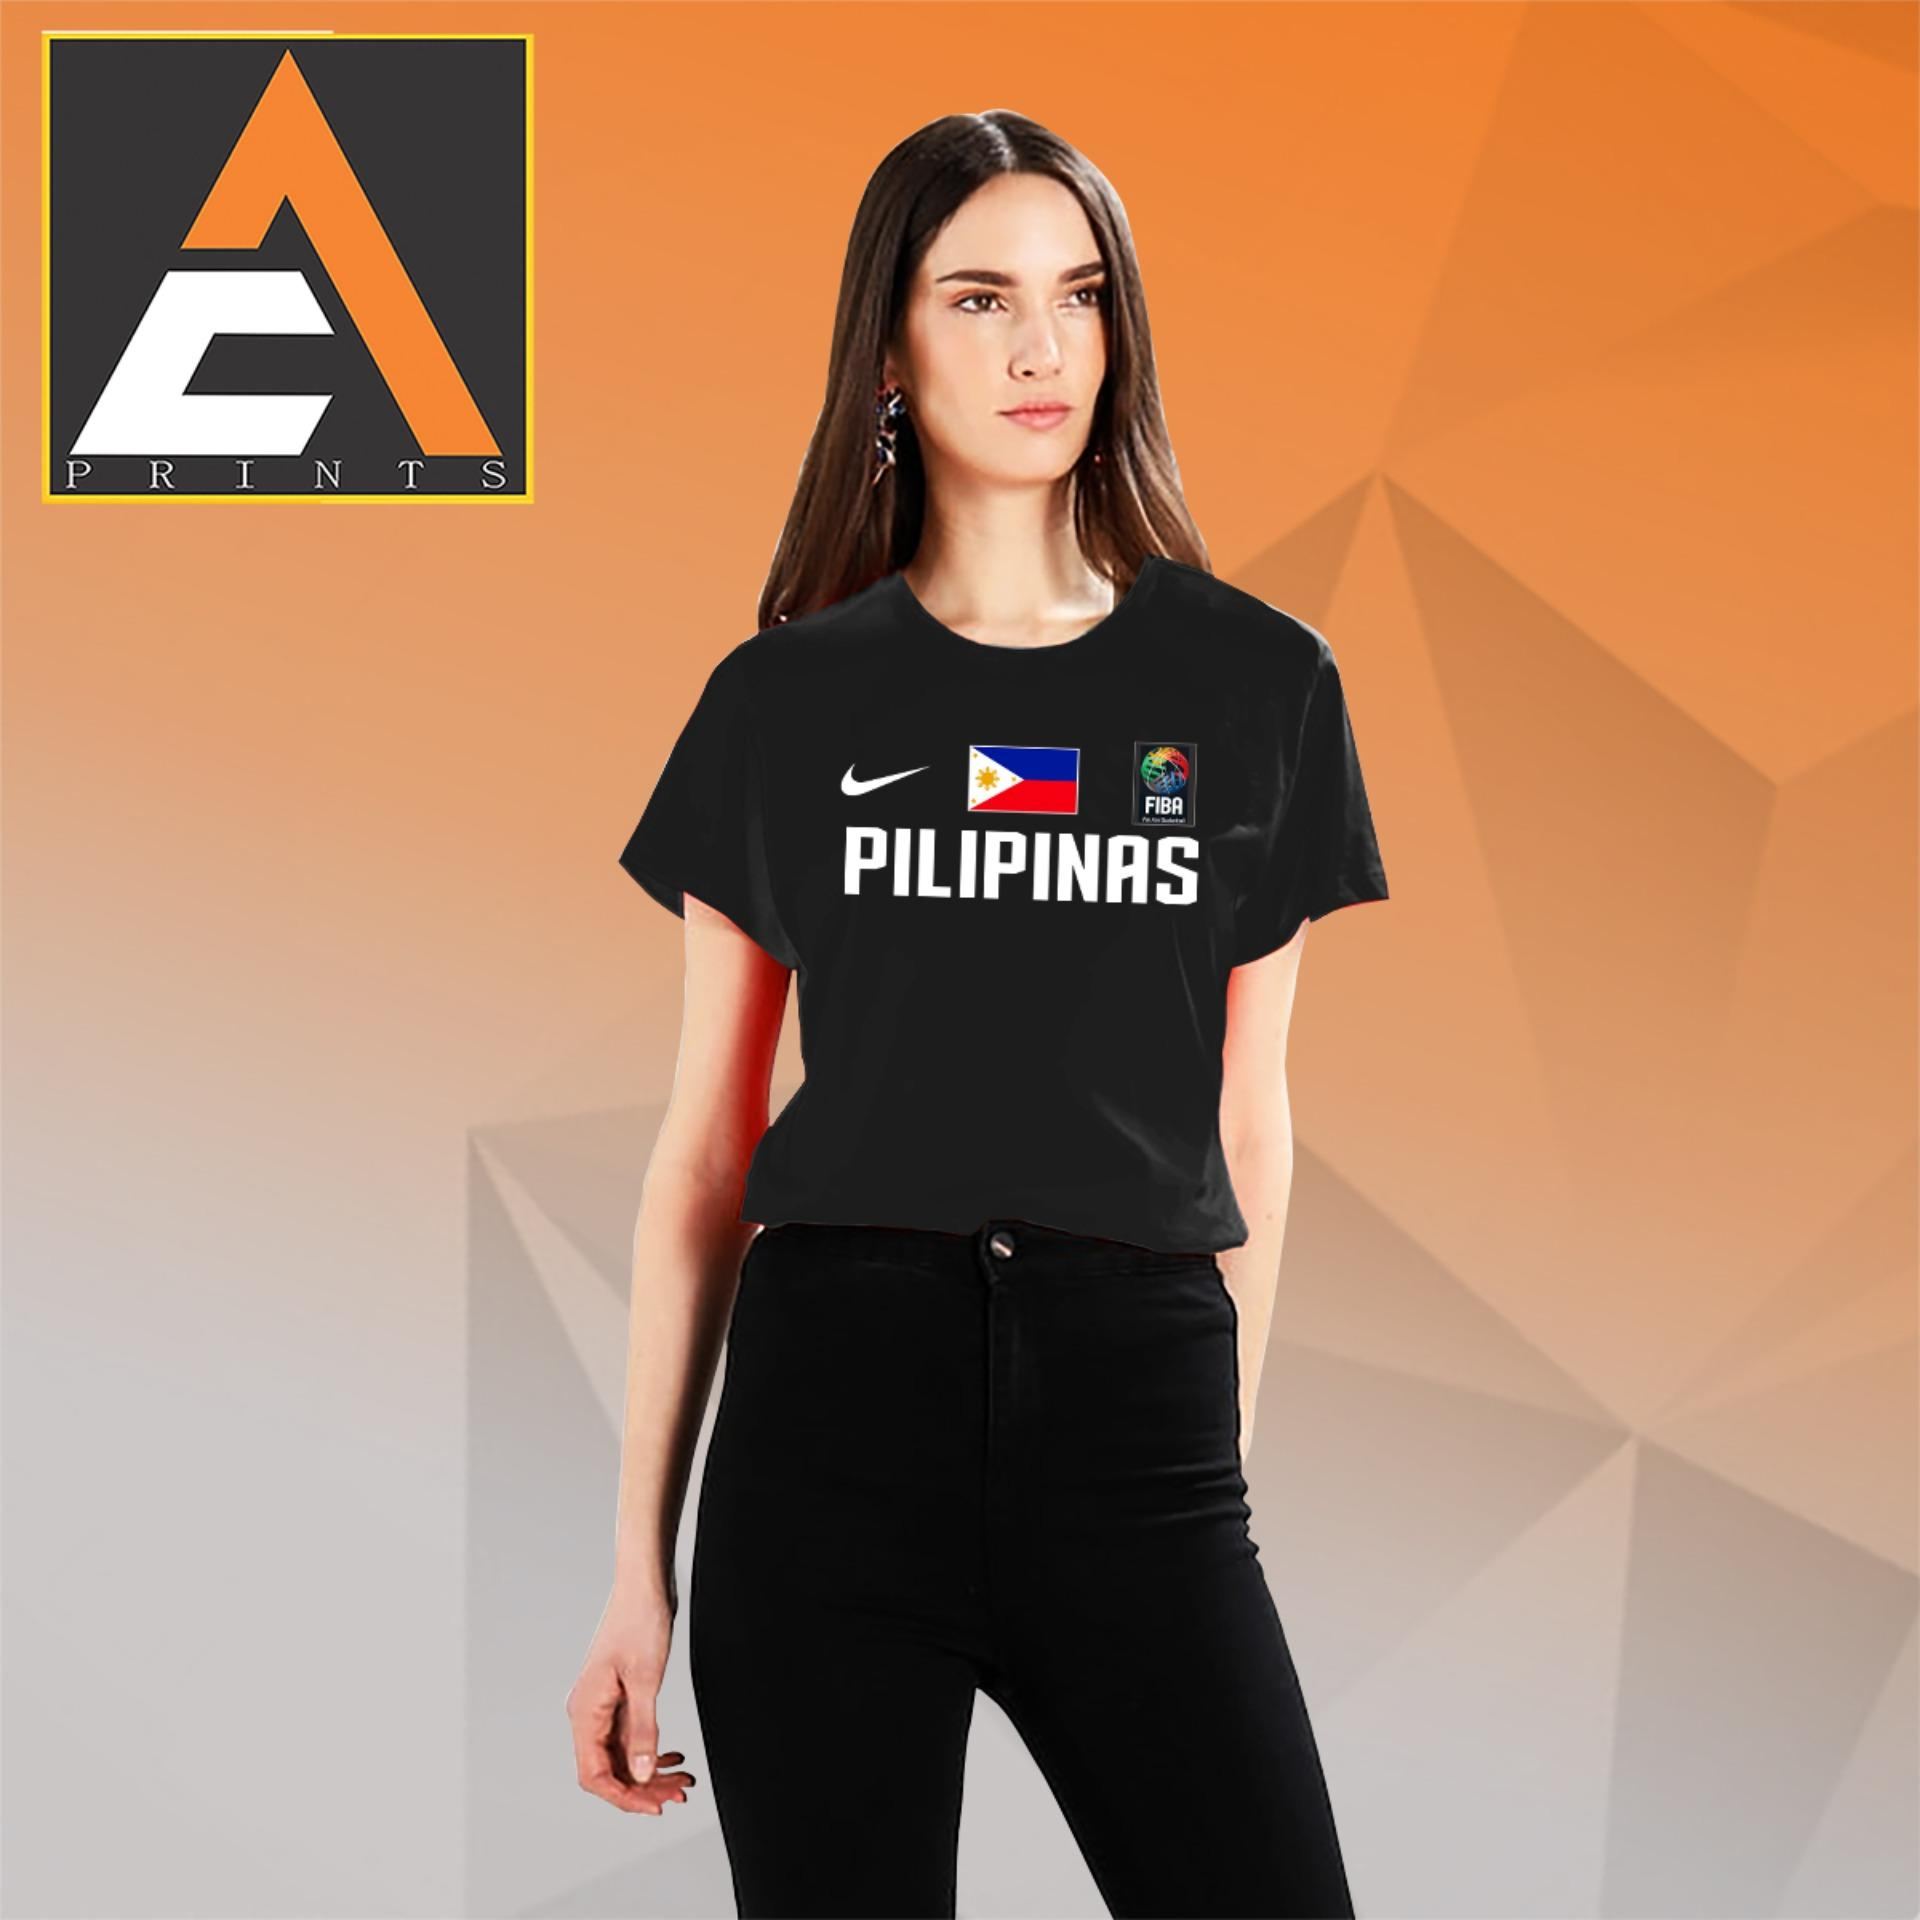 02c82330a53d7 Product details of Gilas Pilipinas t shirt Basketball Shirt Unisex(Men Women )(Male Female)(Gildan) T-shirts Tees T shirts Tshirts  Tees(black